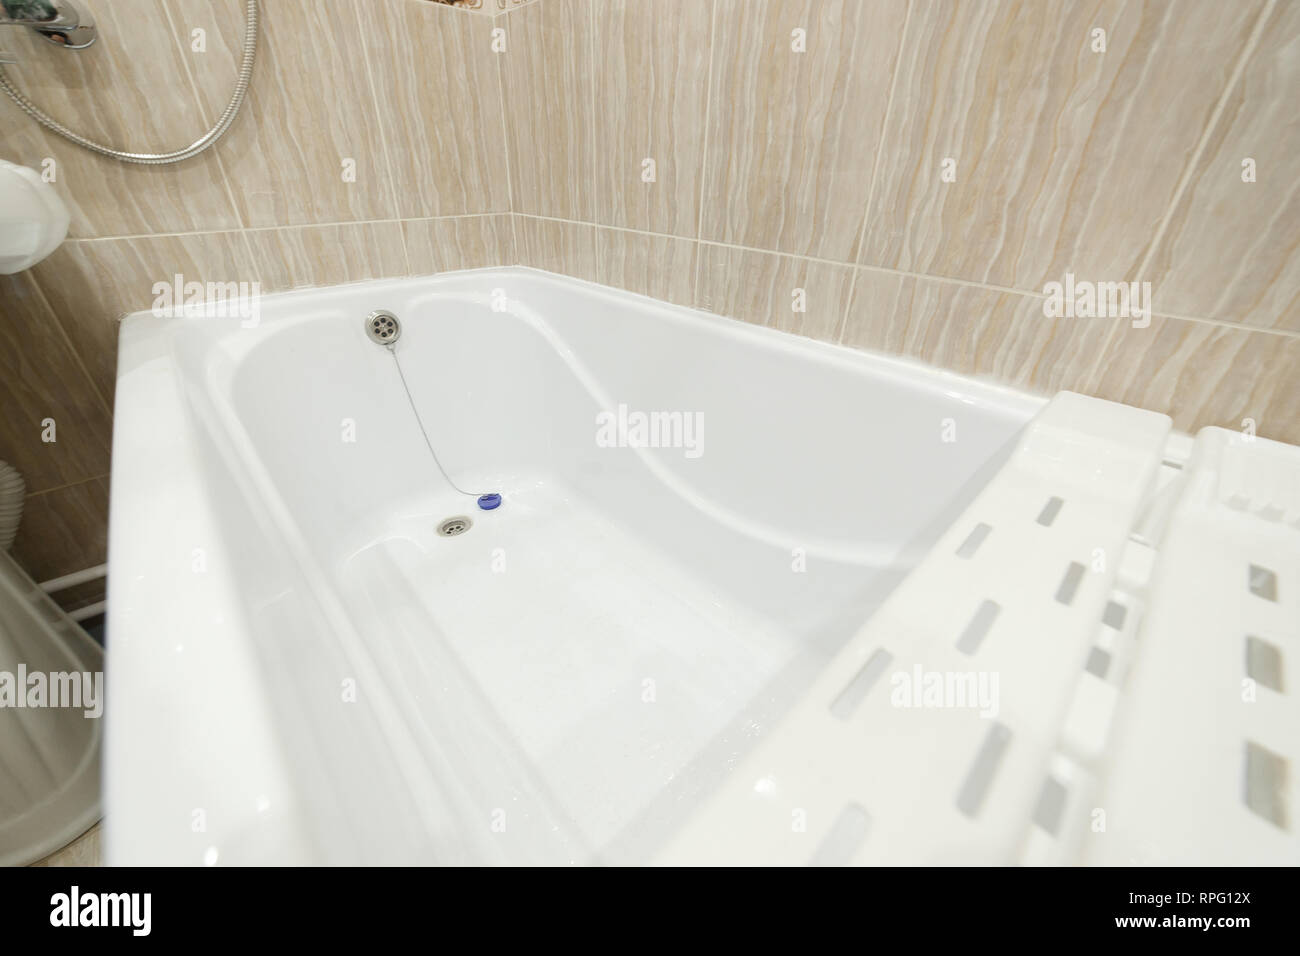 Pulire Vasca Da Bagno.Pulire Il Bagno Bagno Vasca Da Bagno Bagno Igiene Bianco